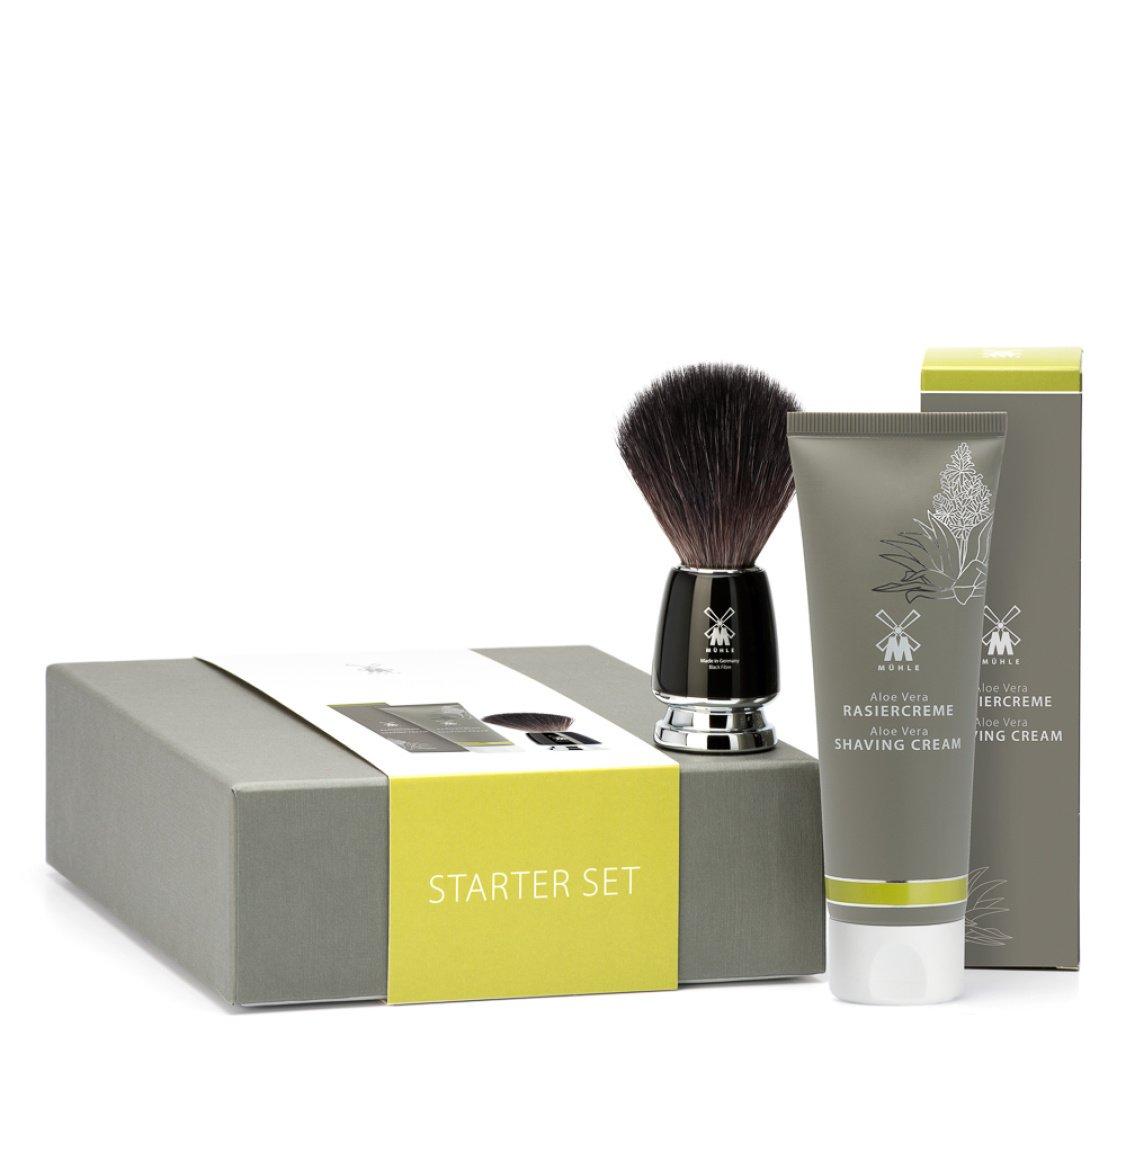 Muhle Rytmo Shaving Brush With Aloe Vera Shaving Cream 75ml Starter Set